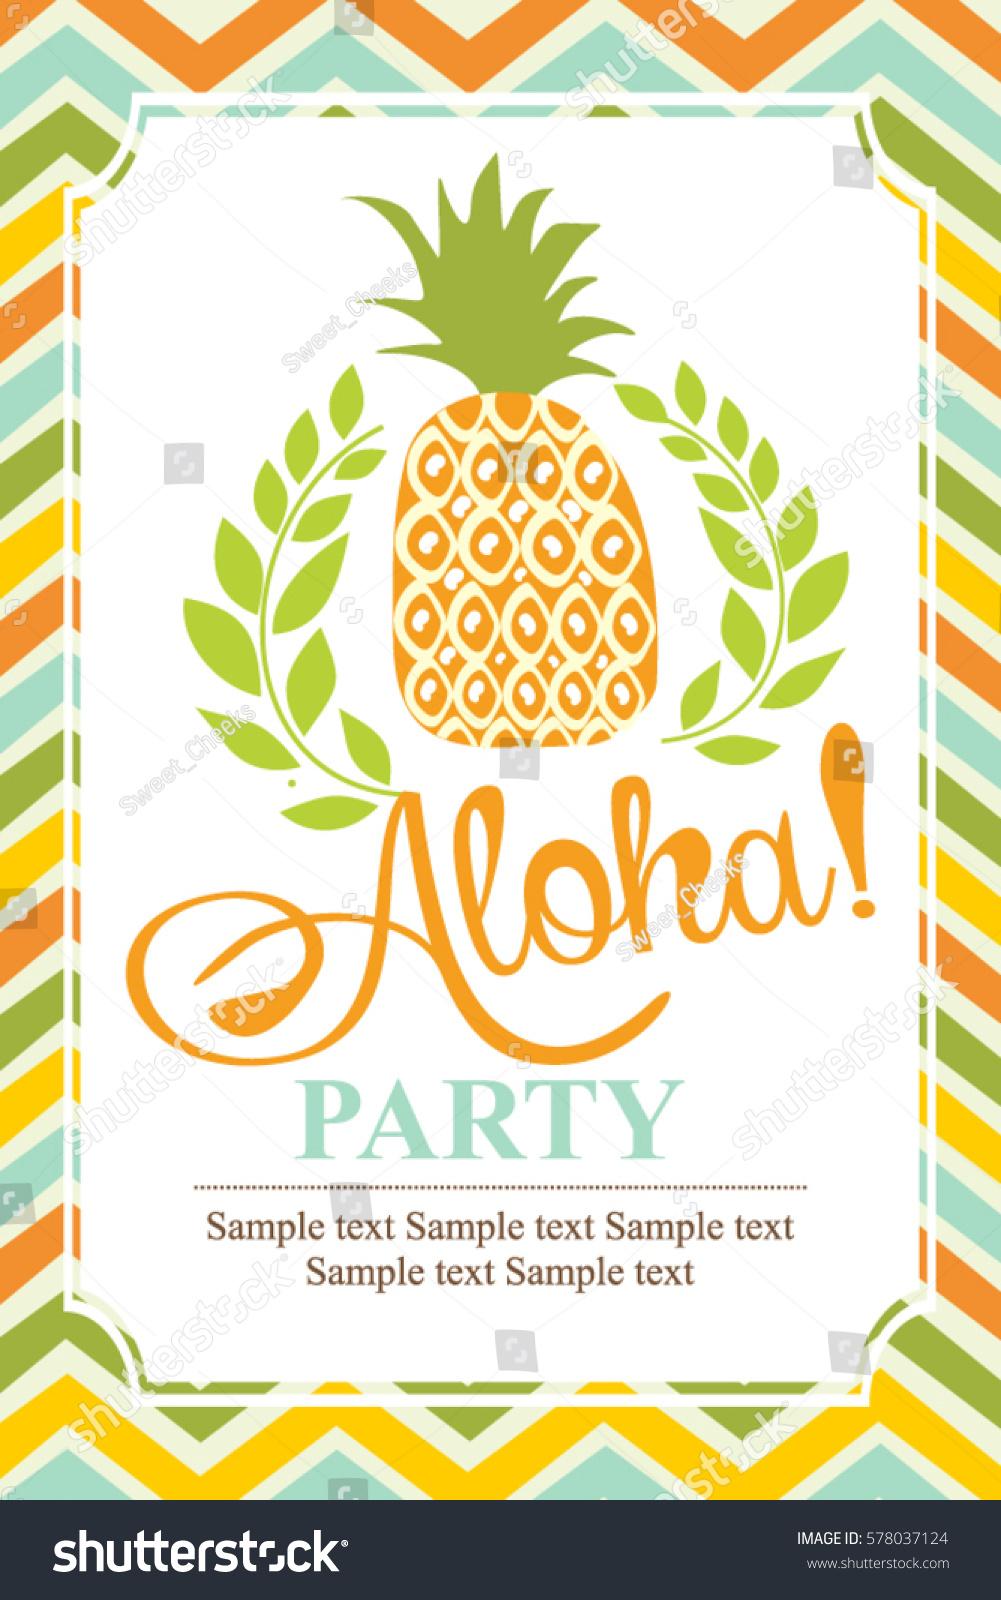 Luau Party Invitation Card Stock Vector 578037124 - Shutterstock